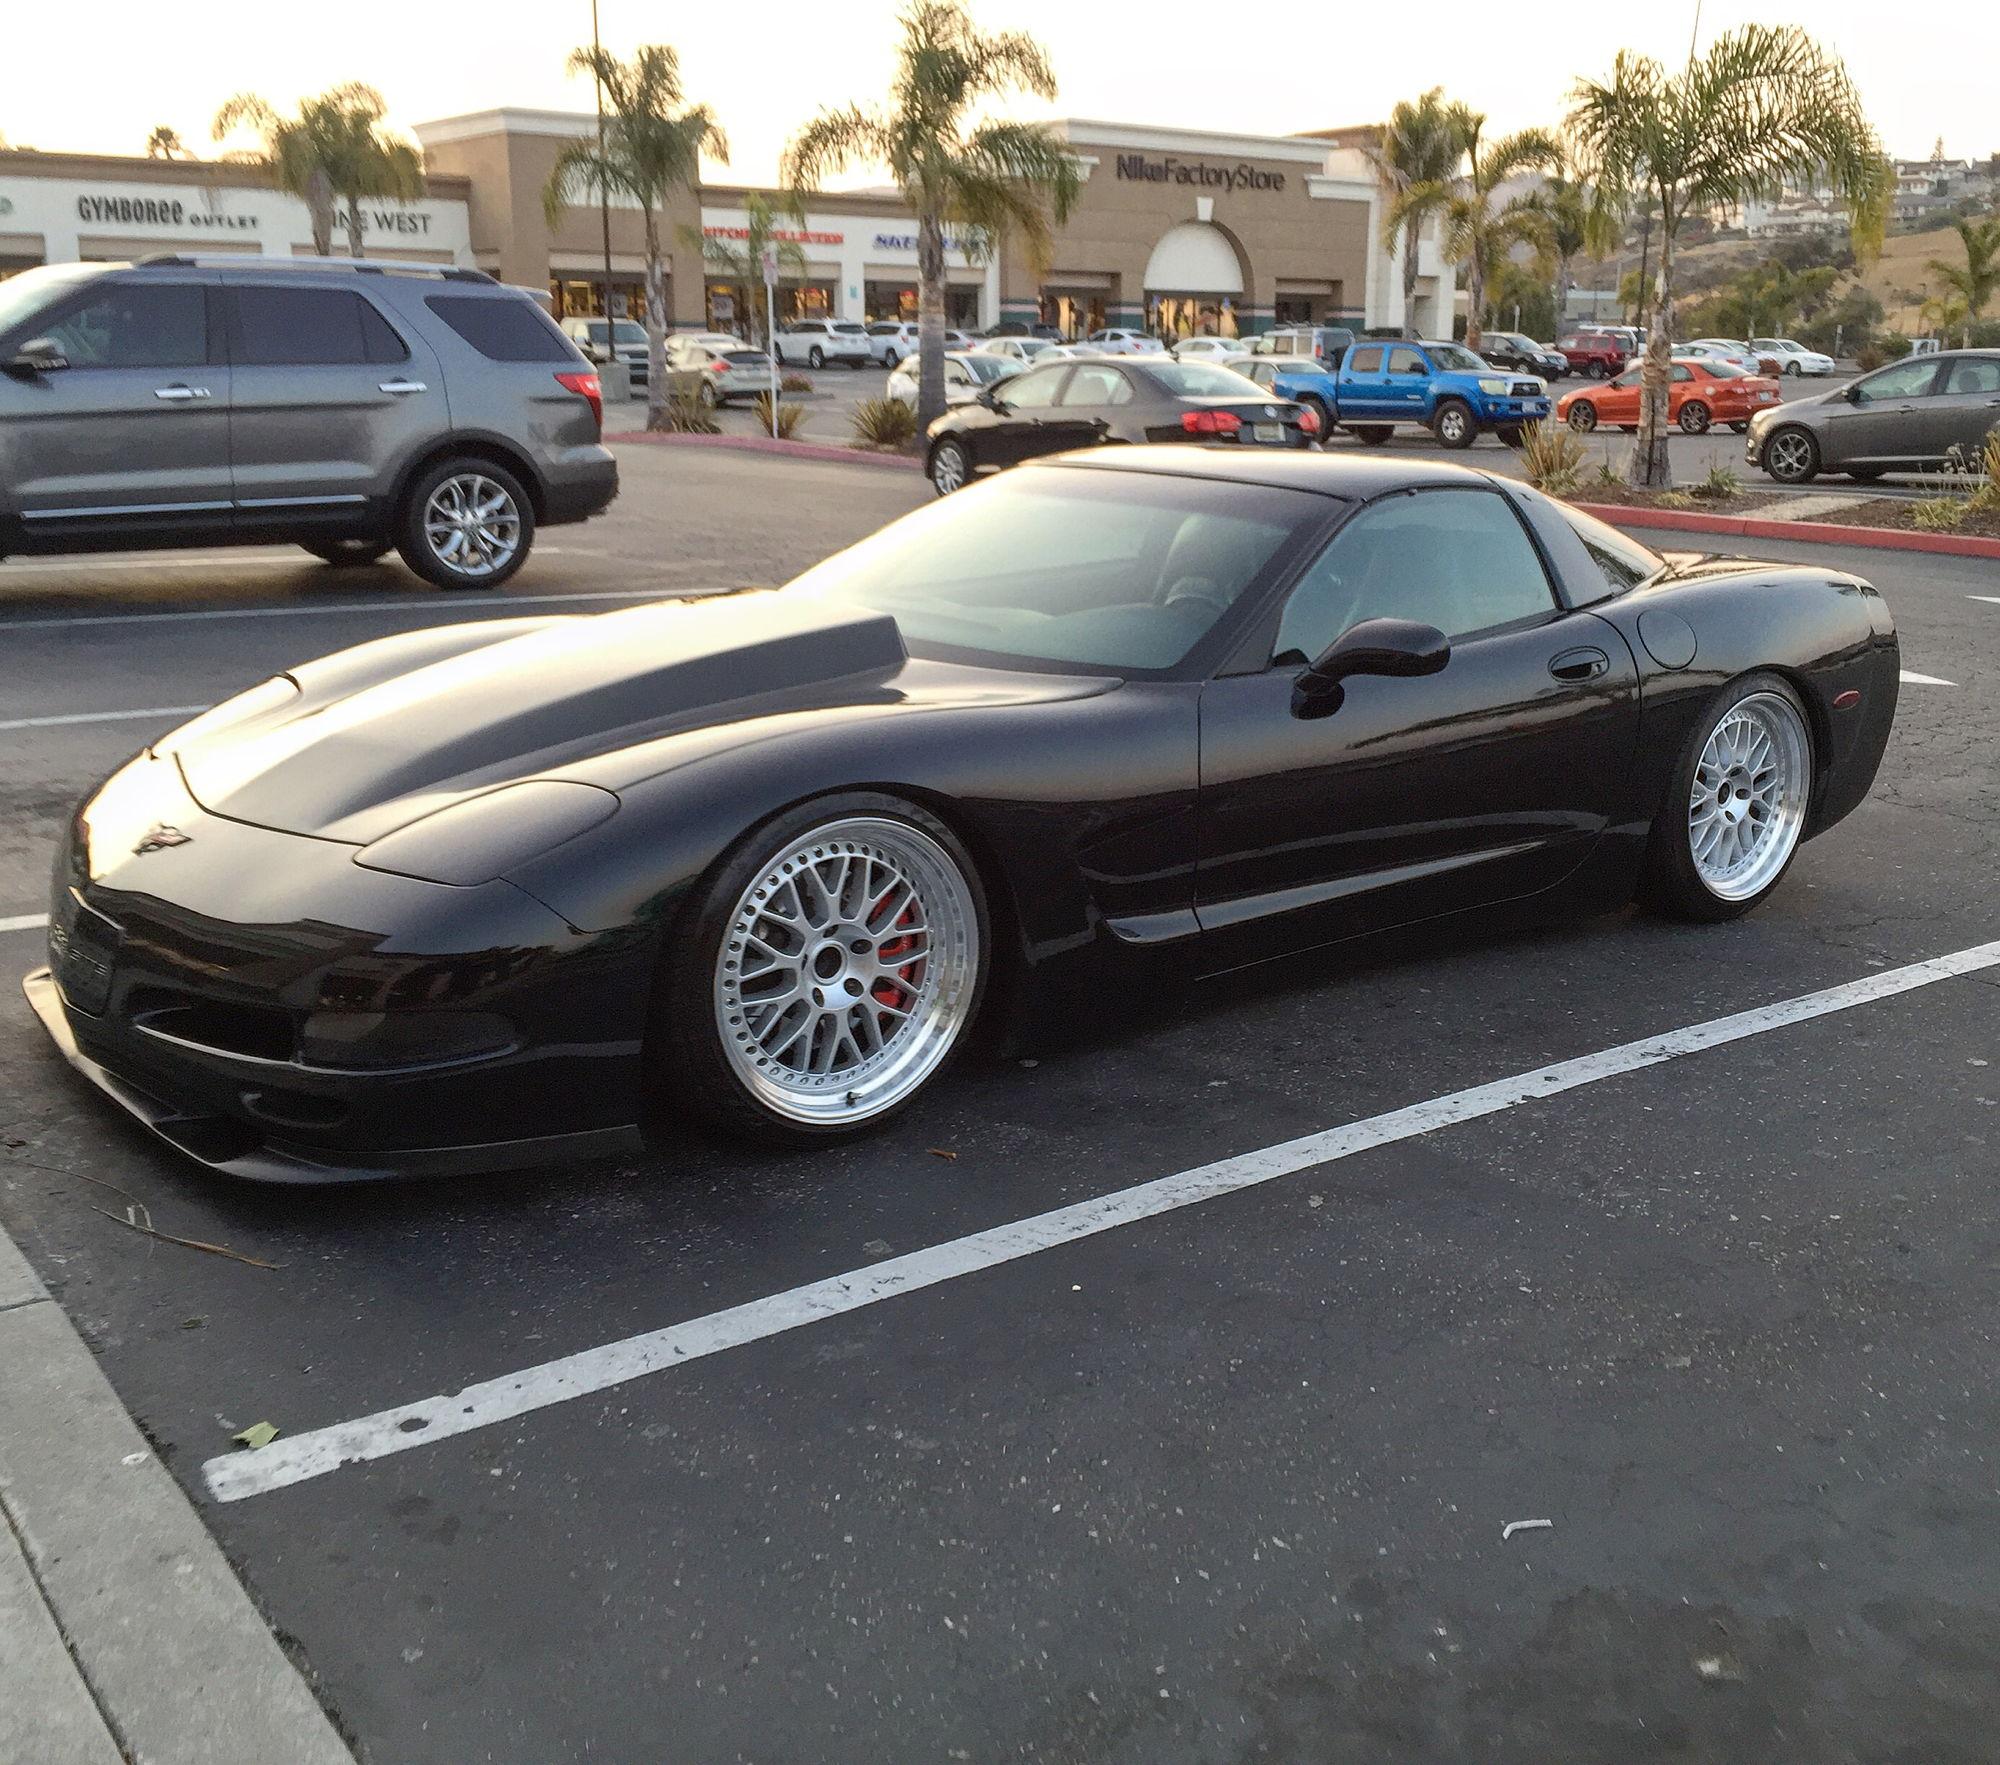 Santa Maria Chevrolet: Chevrolet Corvette Forum